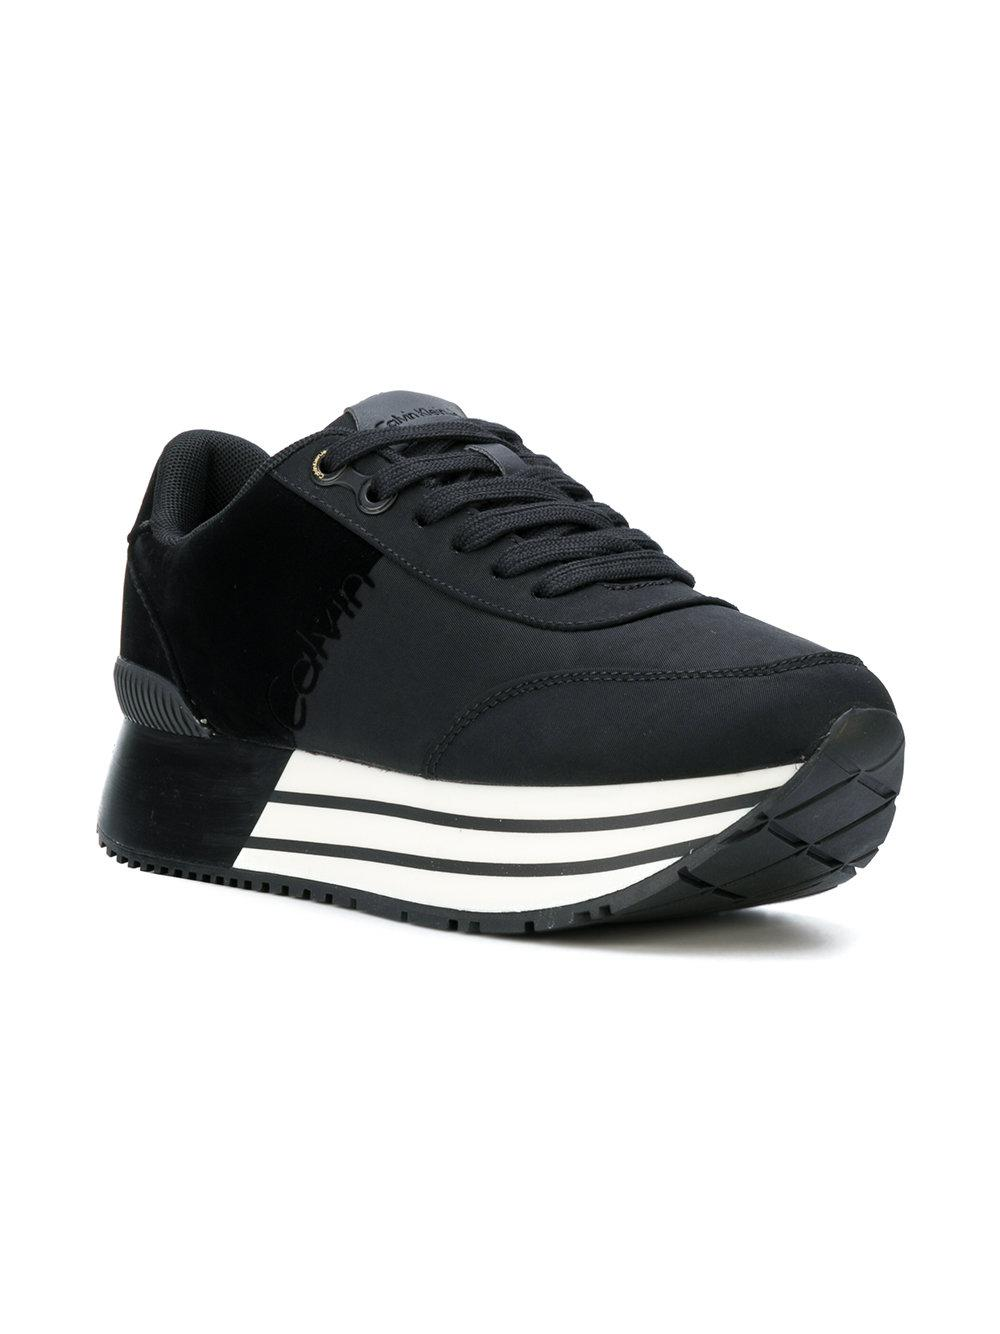 205c46869a55 https   www.lyst.com shoes boris-bidjan-saberi-11-ridged-sneakers-1 ...